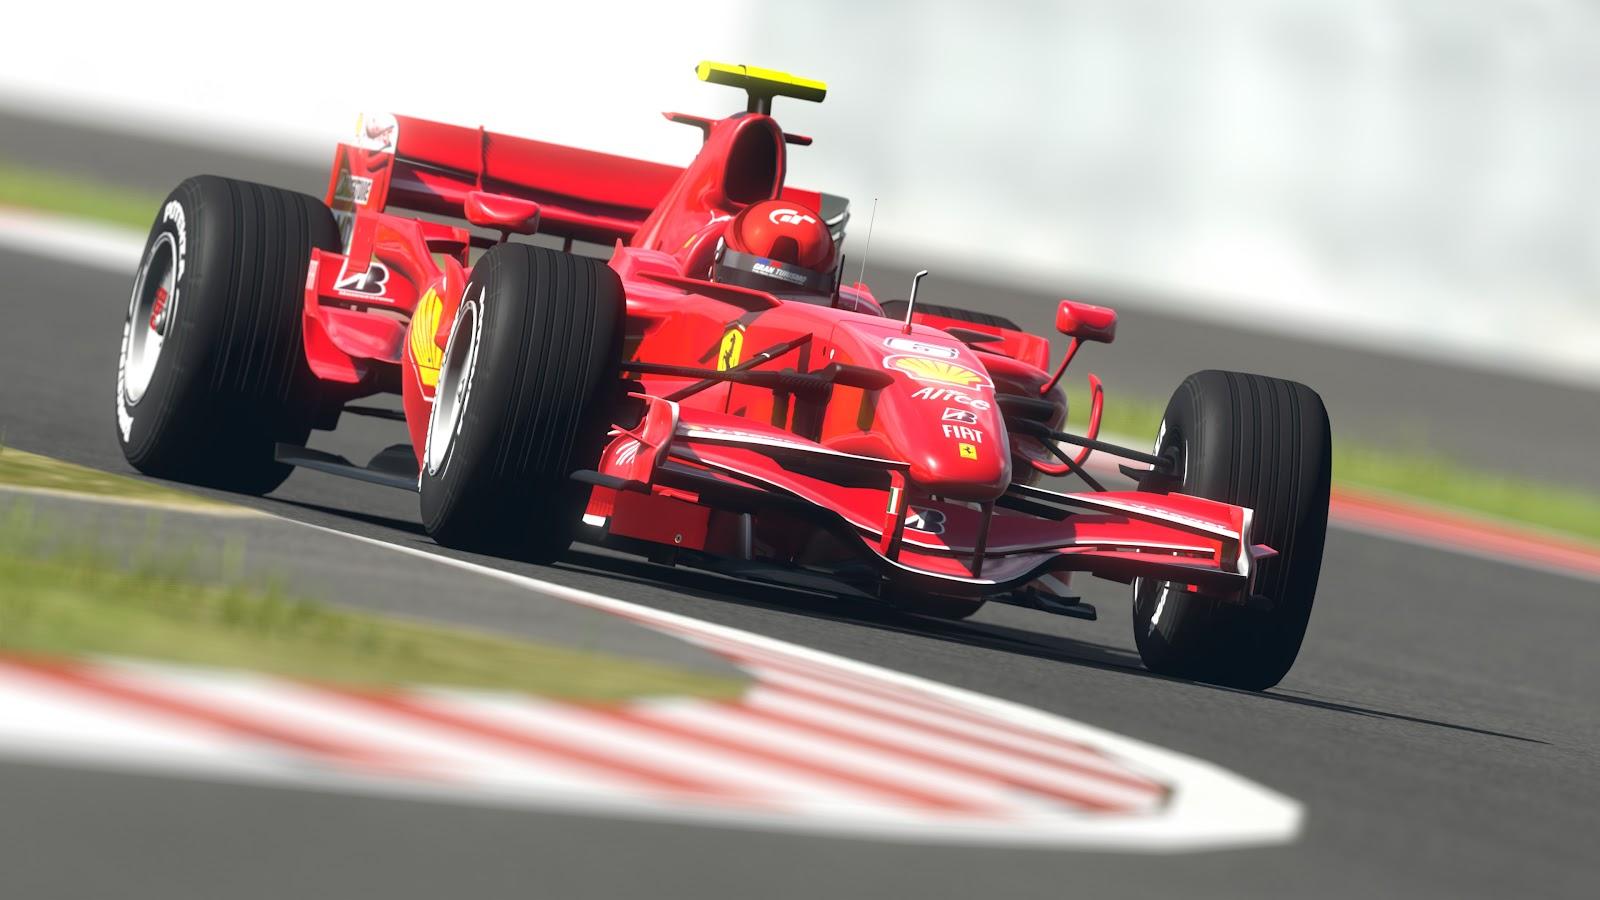 Formula Cars: Formula One Cars HD Wallpapers, Formula 1 Car Wallpapers